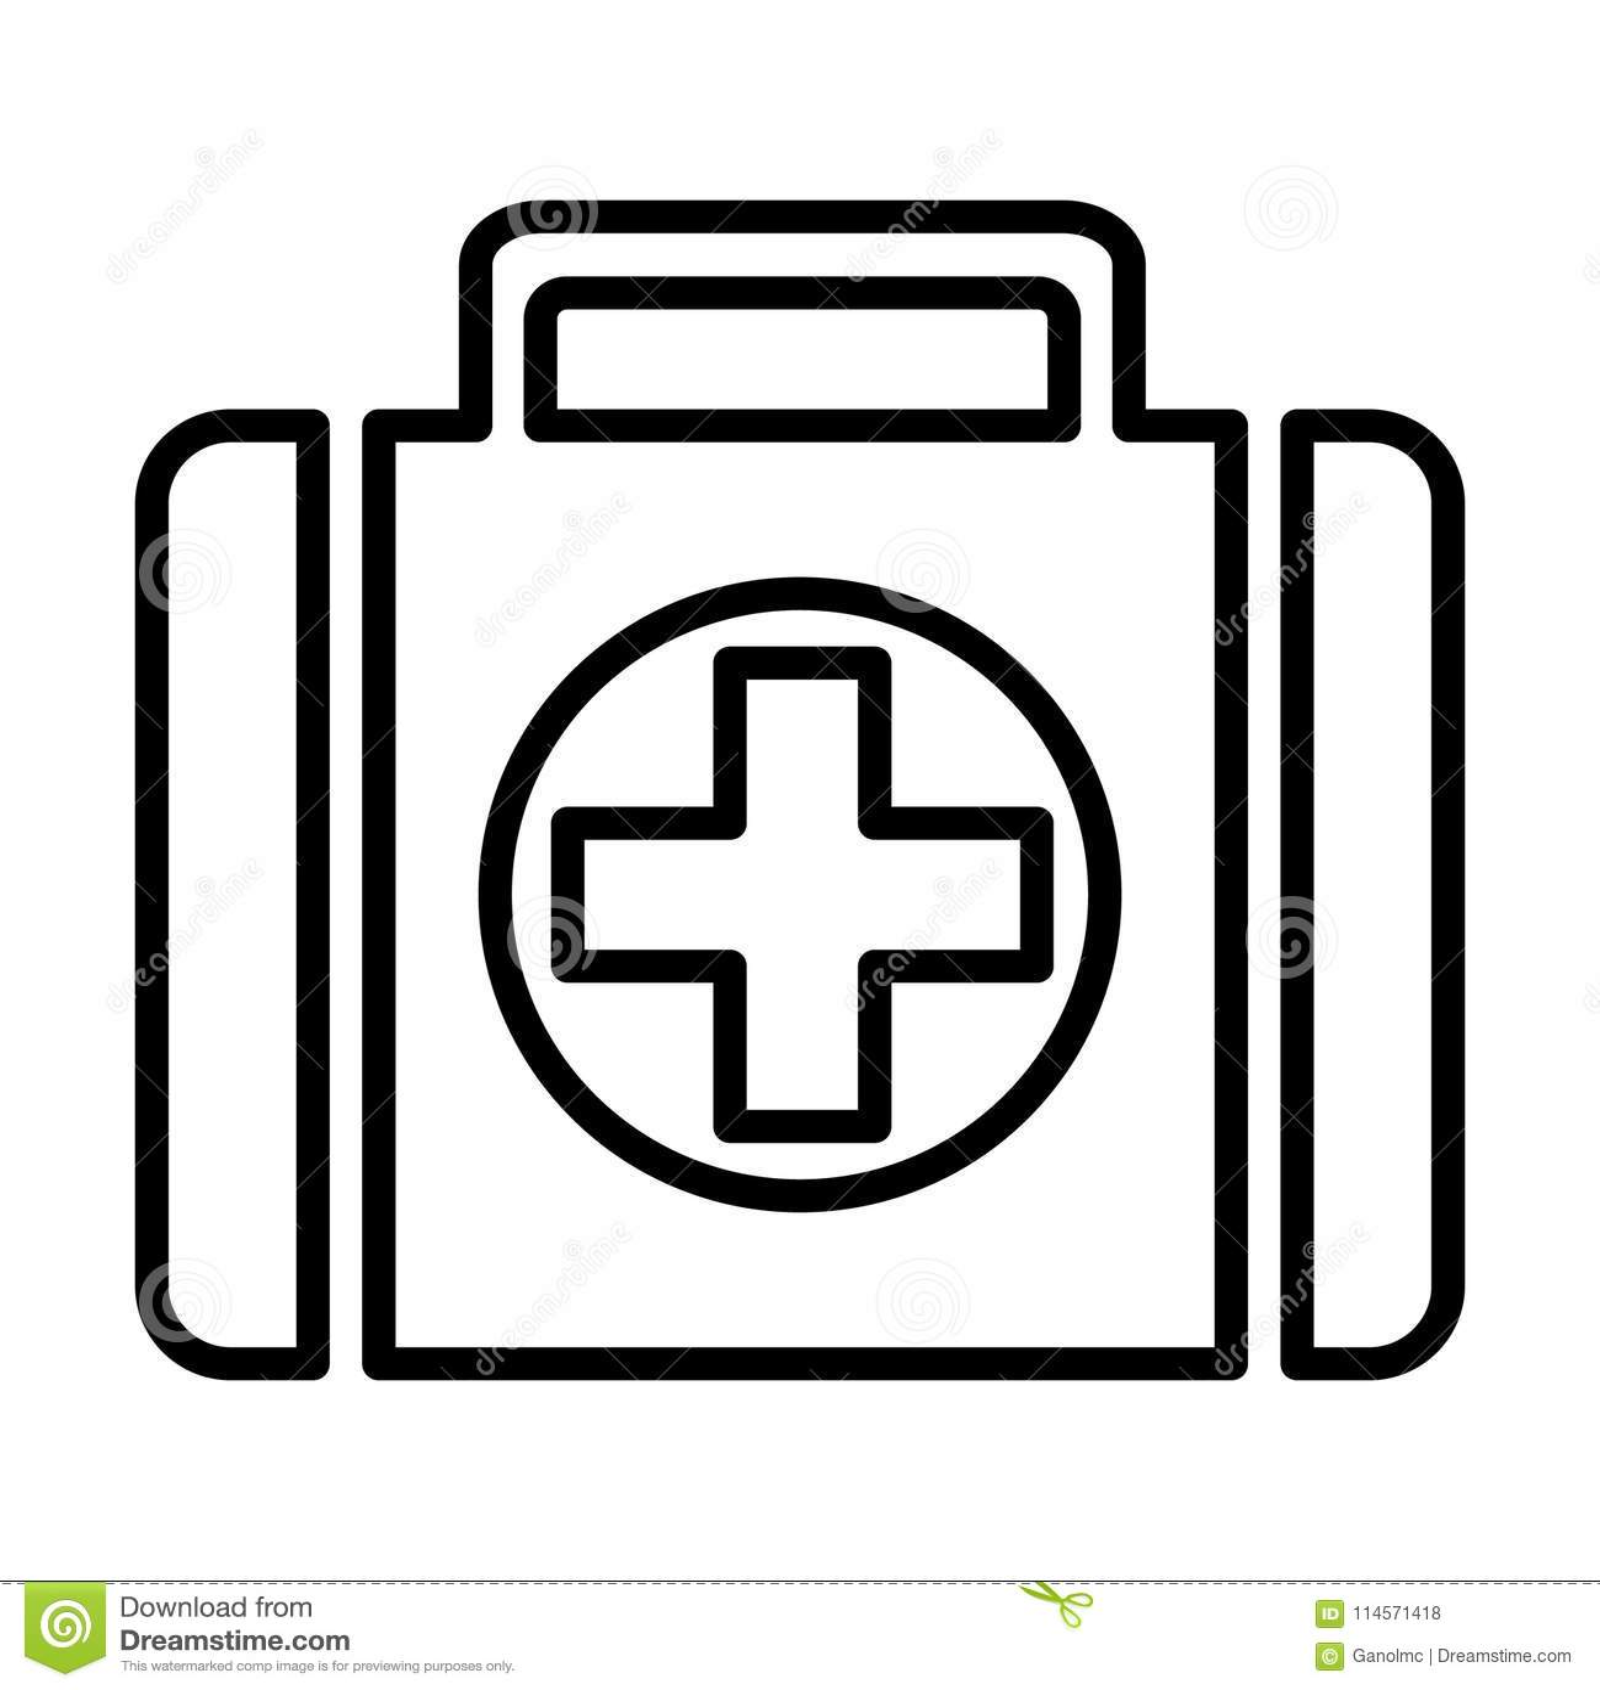 Erste-Hilfe-Kit Line Icon Piktogramm des Vektor-96x96